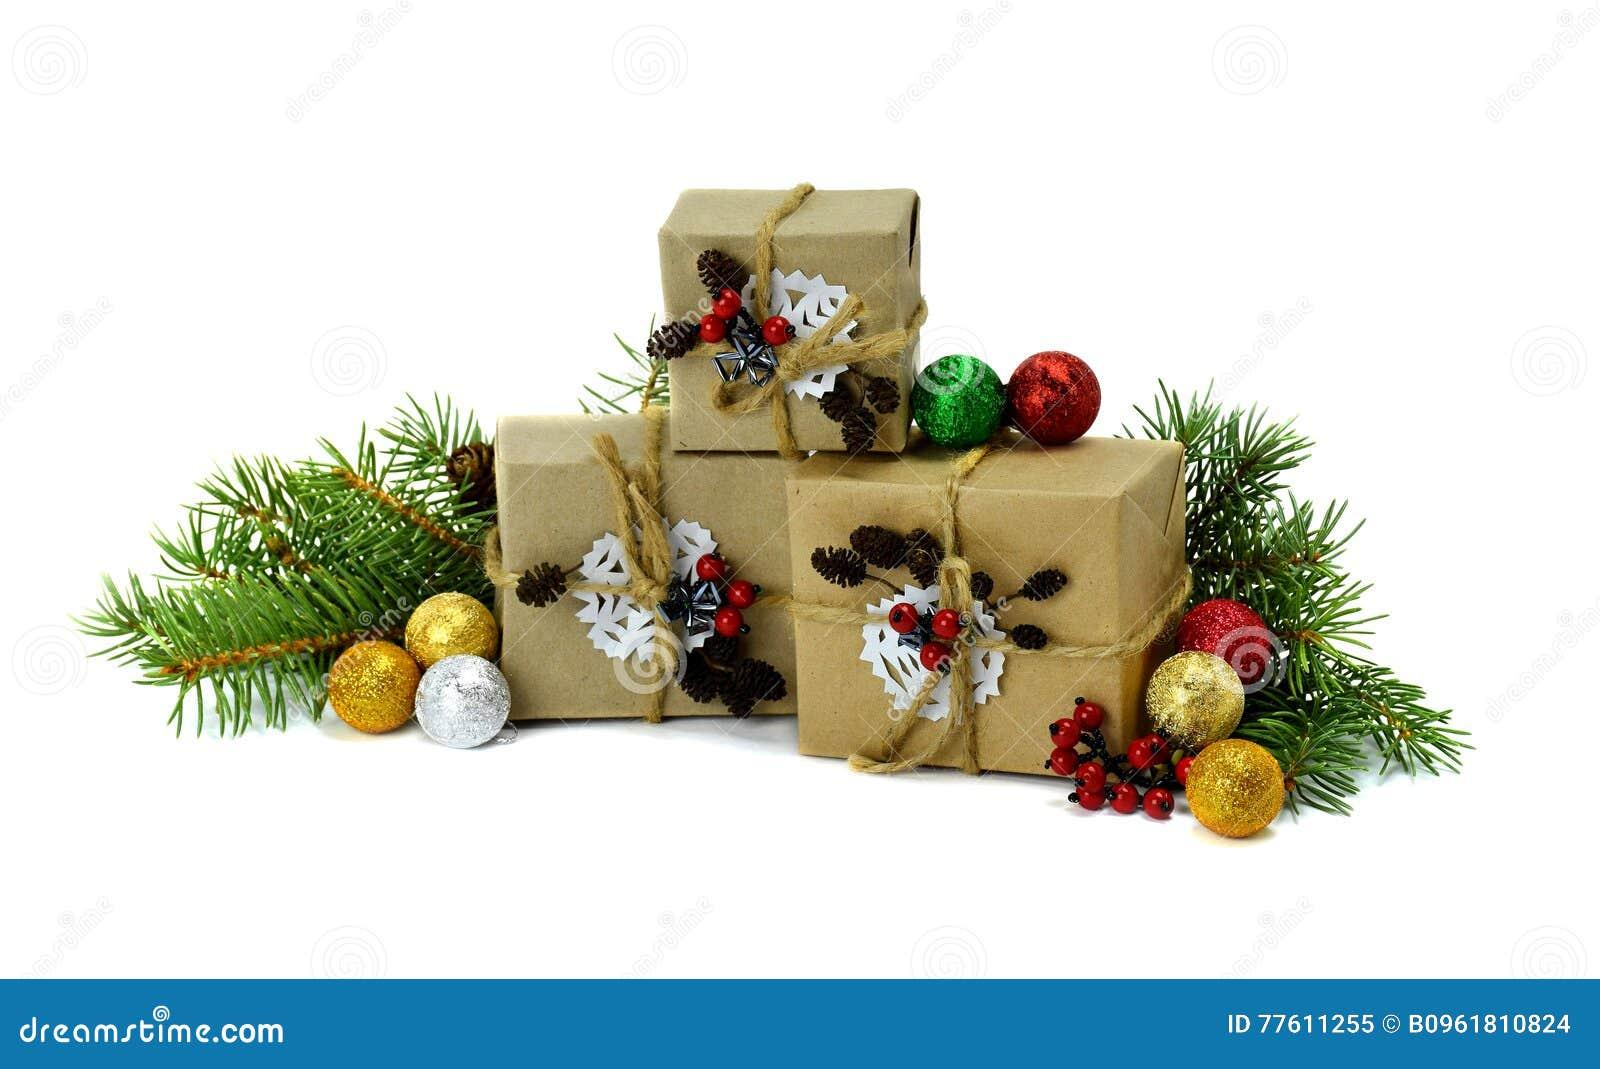 Handgemachte Geschenke, Bereich, Baum, Kegel, Rote Beeren ...